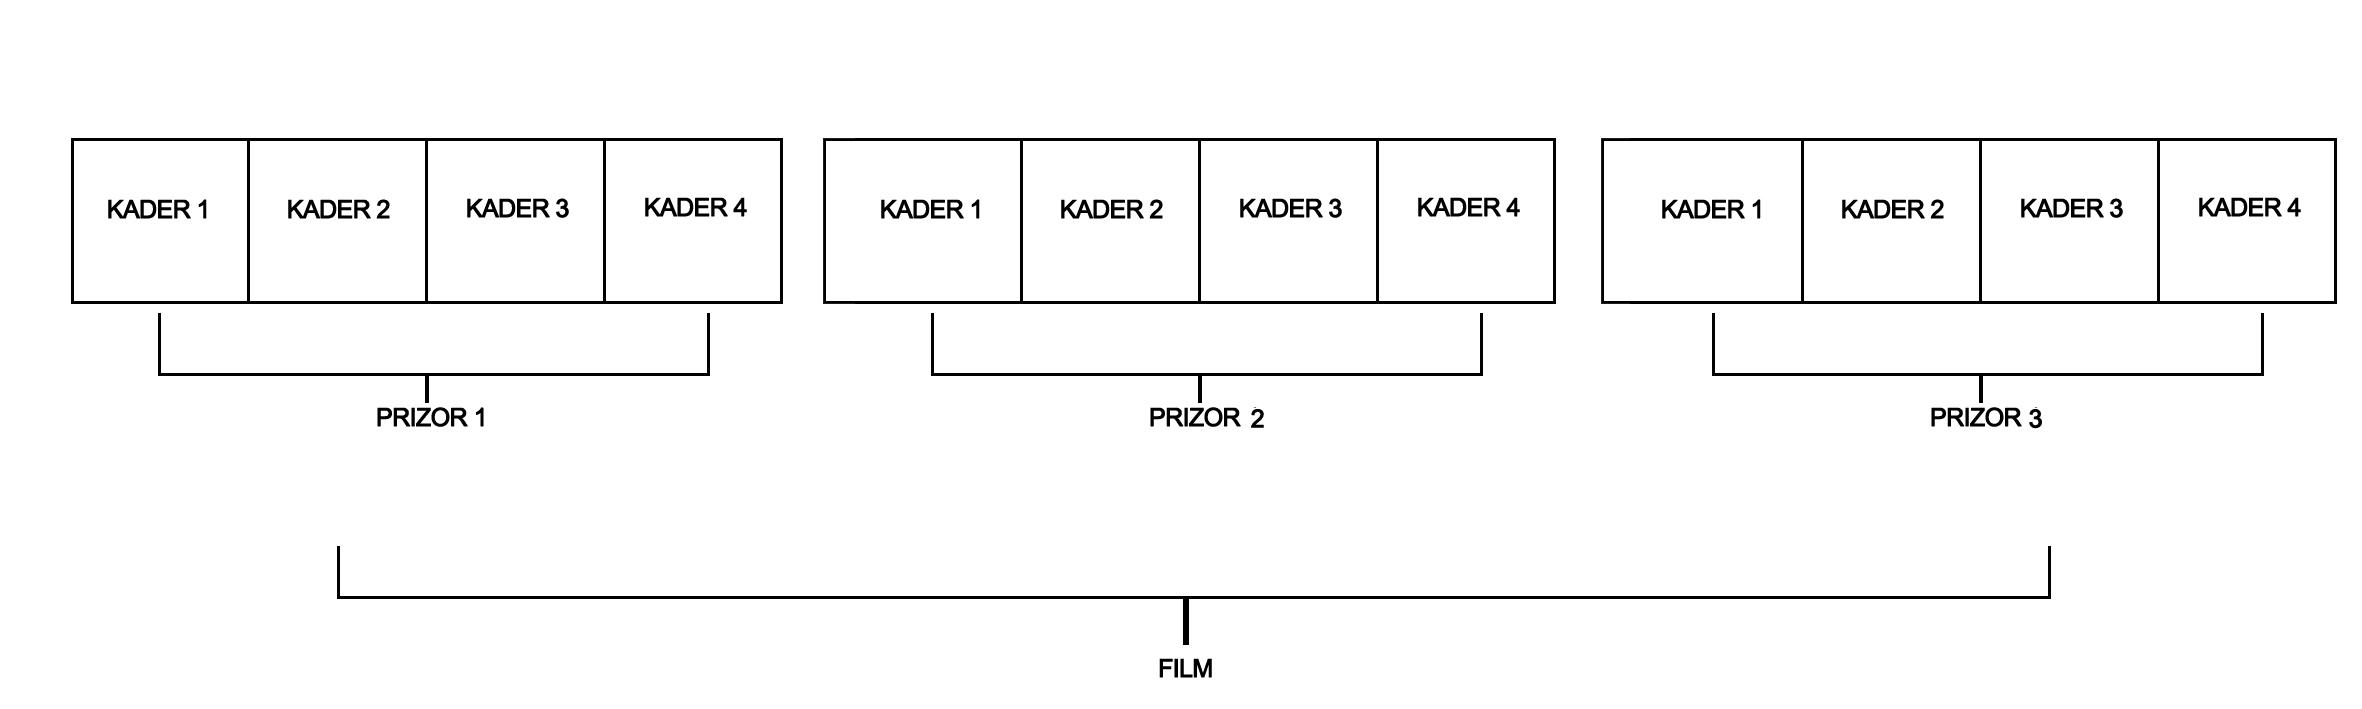 04oncepts of editing_prizor v film slo